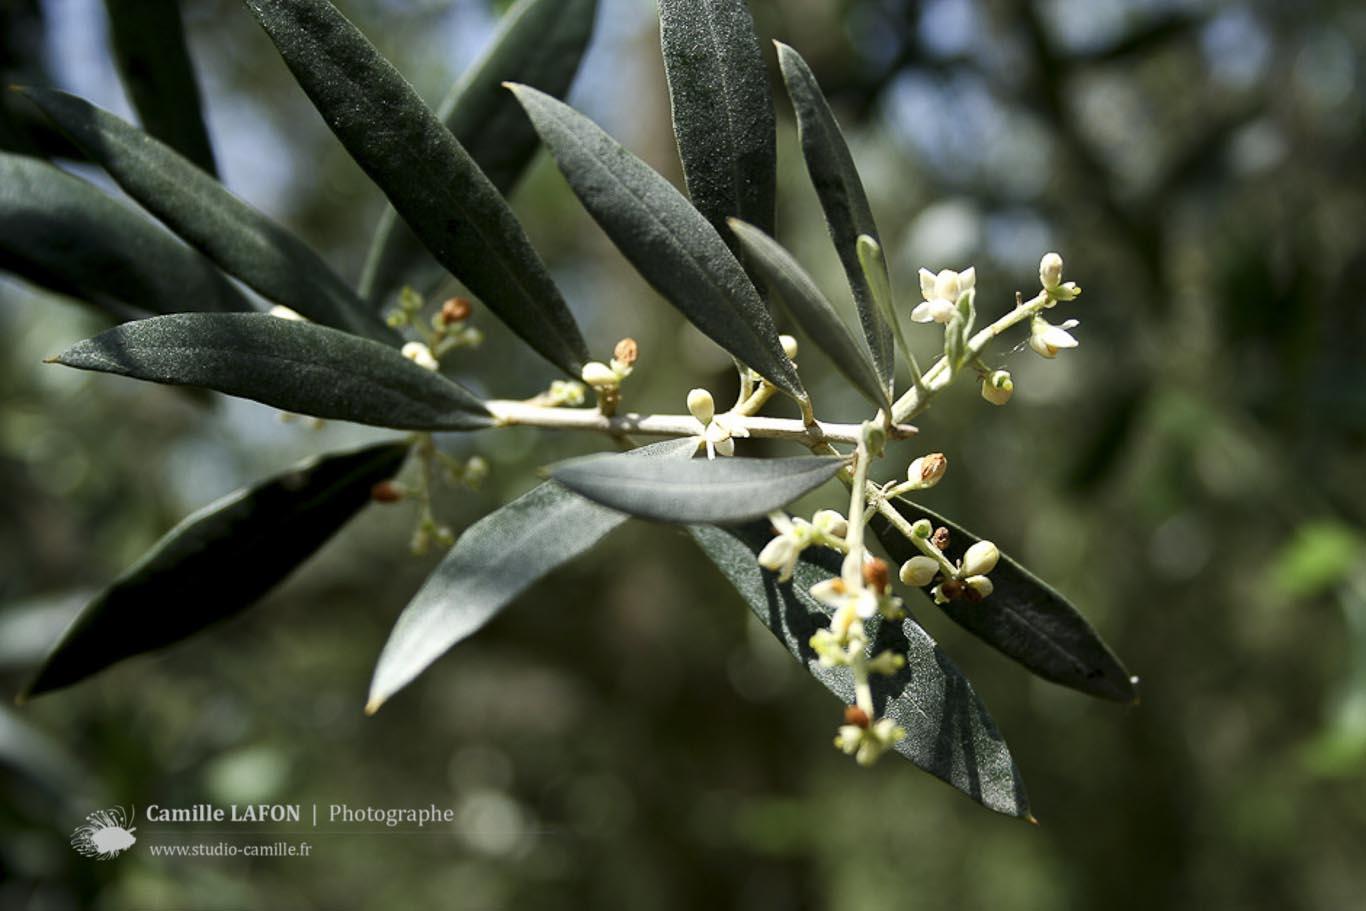 photographe-montpellier-ecorce-arbre-orange.jpg